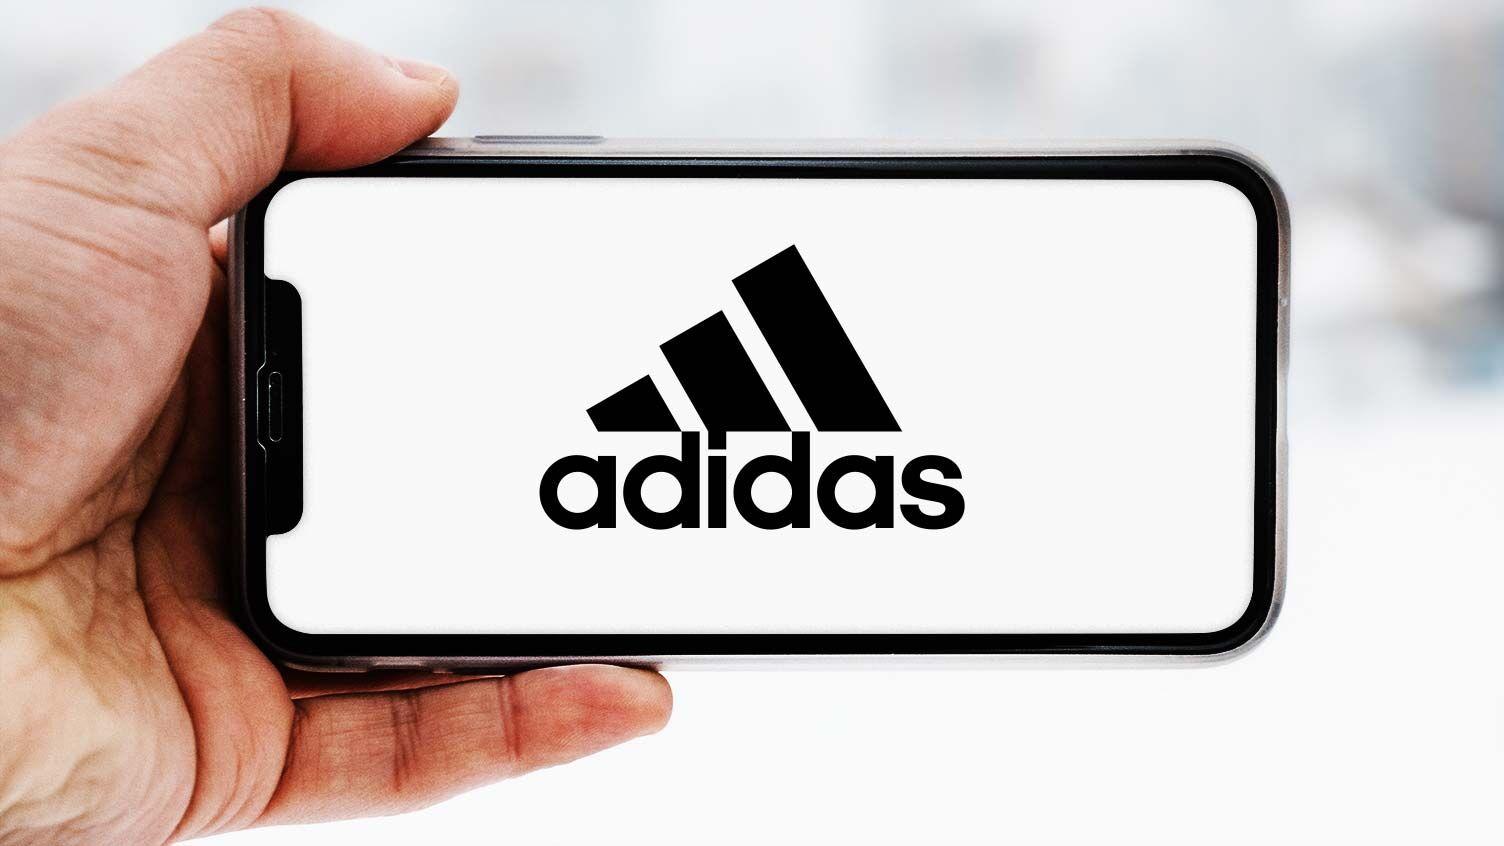 adidas-aktie-im-fokus